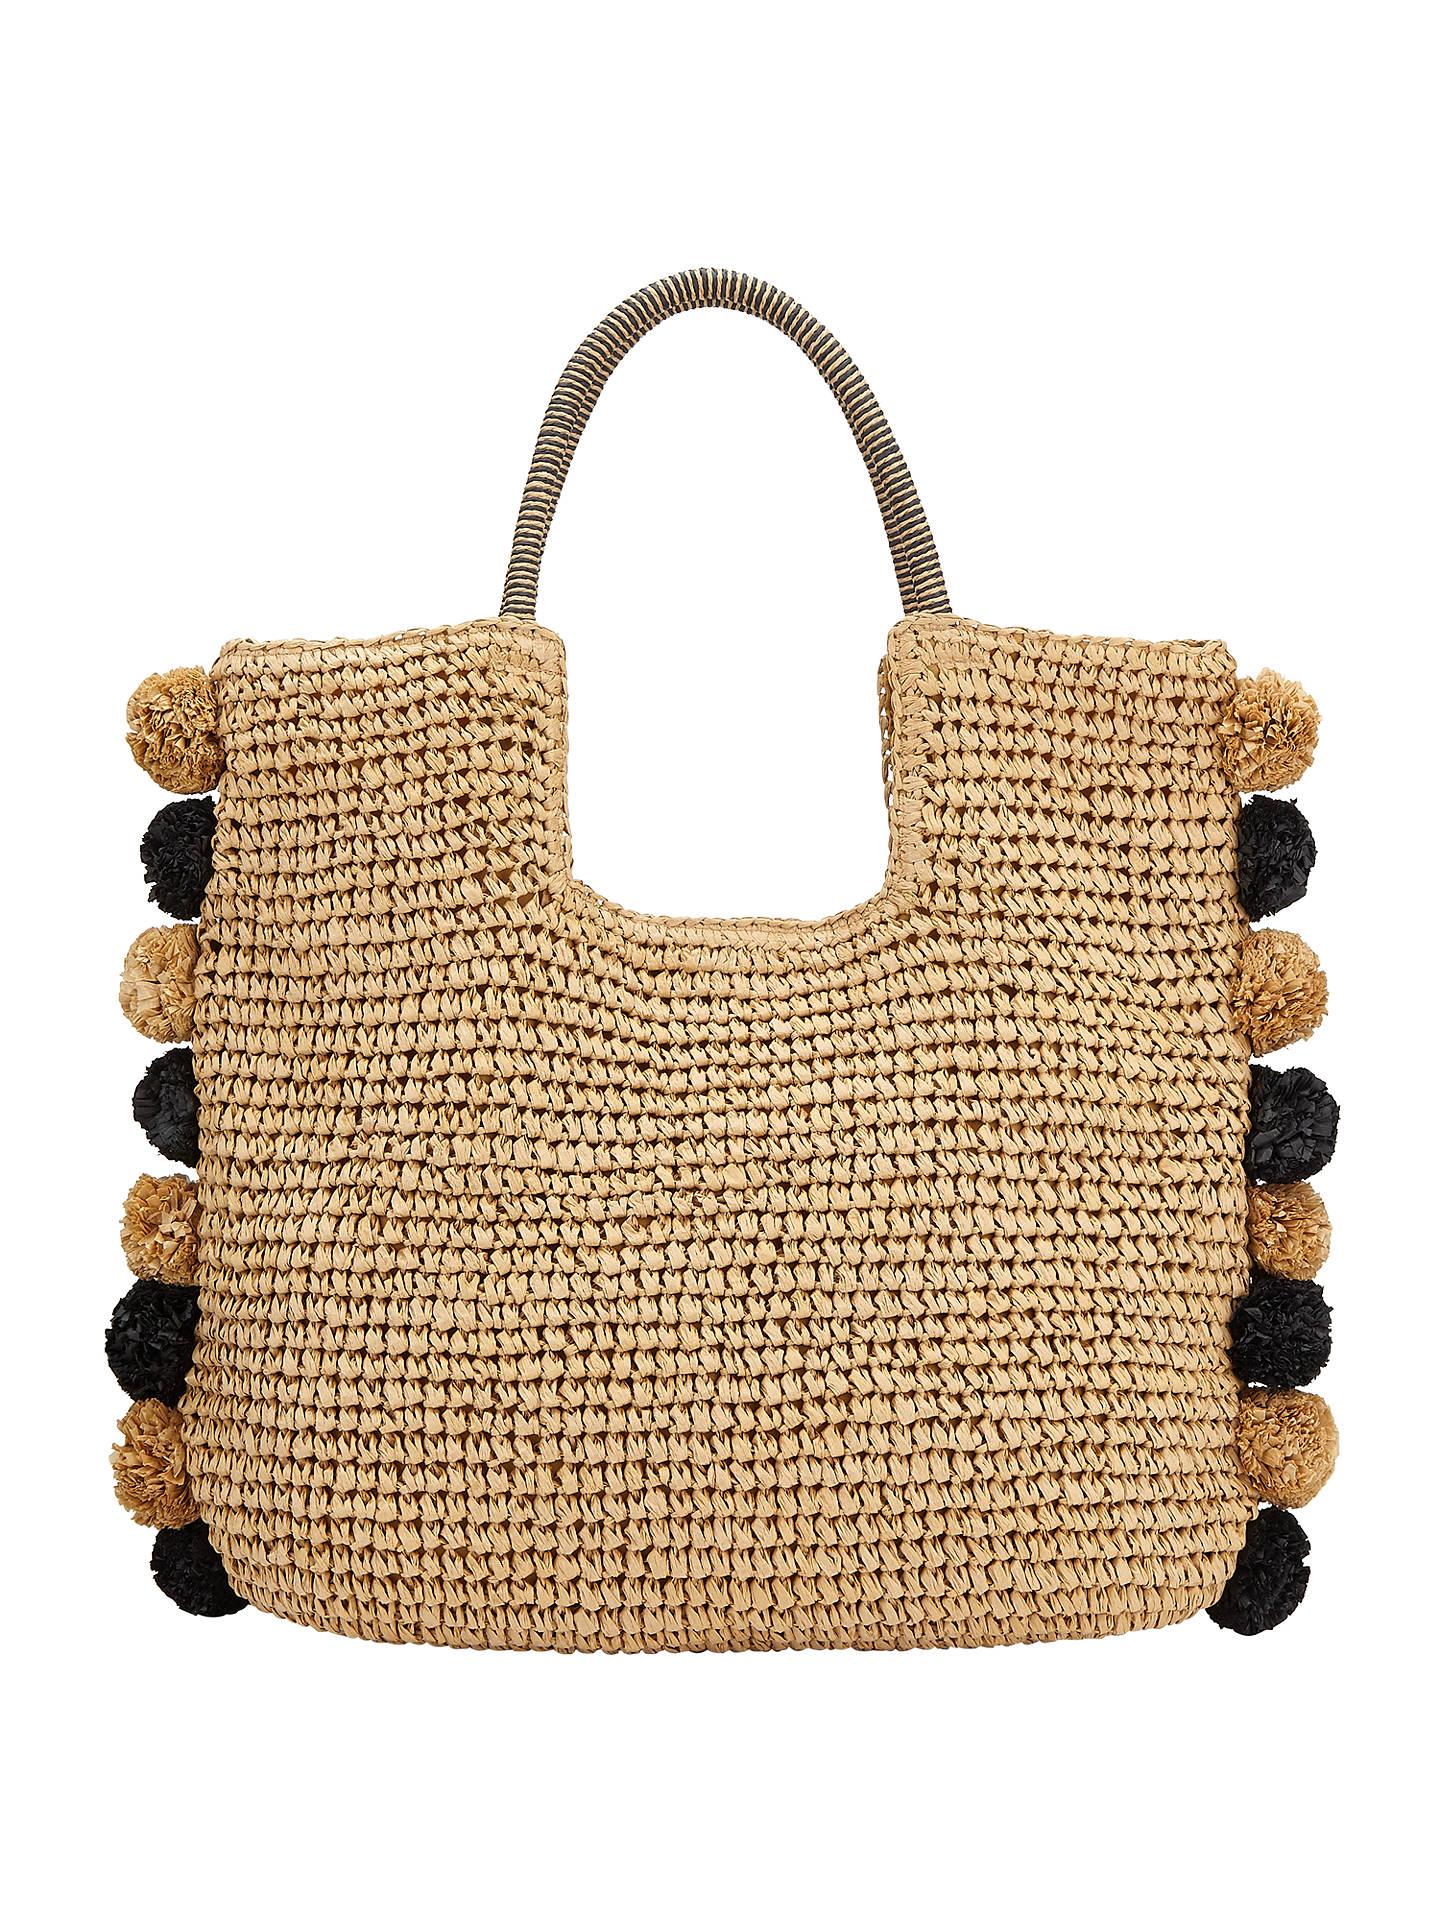 lowest price 5536c 3b5e1 BuyJohn Lewis Pom Pom Straw Grab Bag, Black  Neutral Online at  johnlewis.com ...